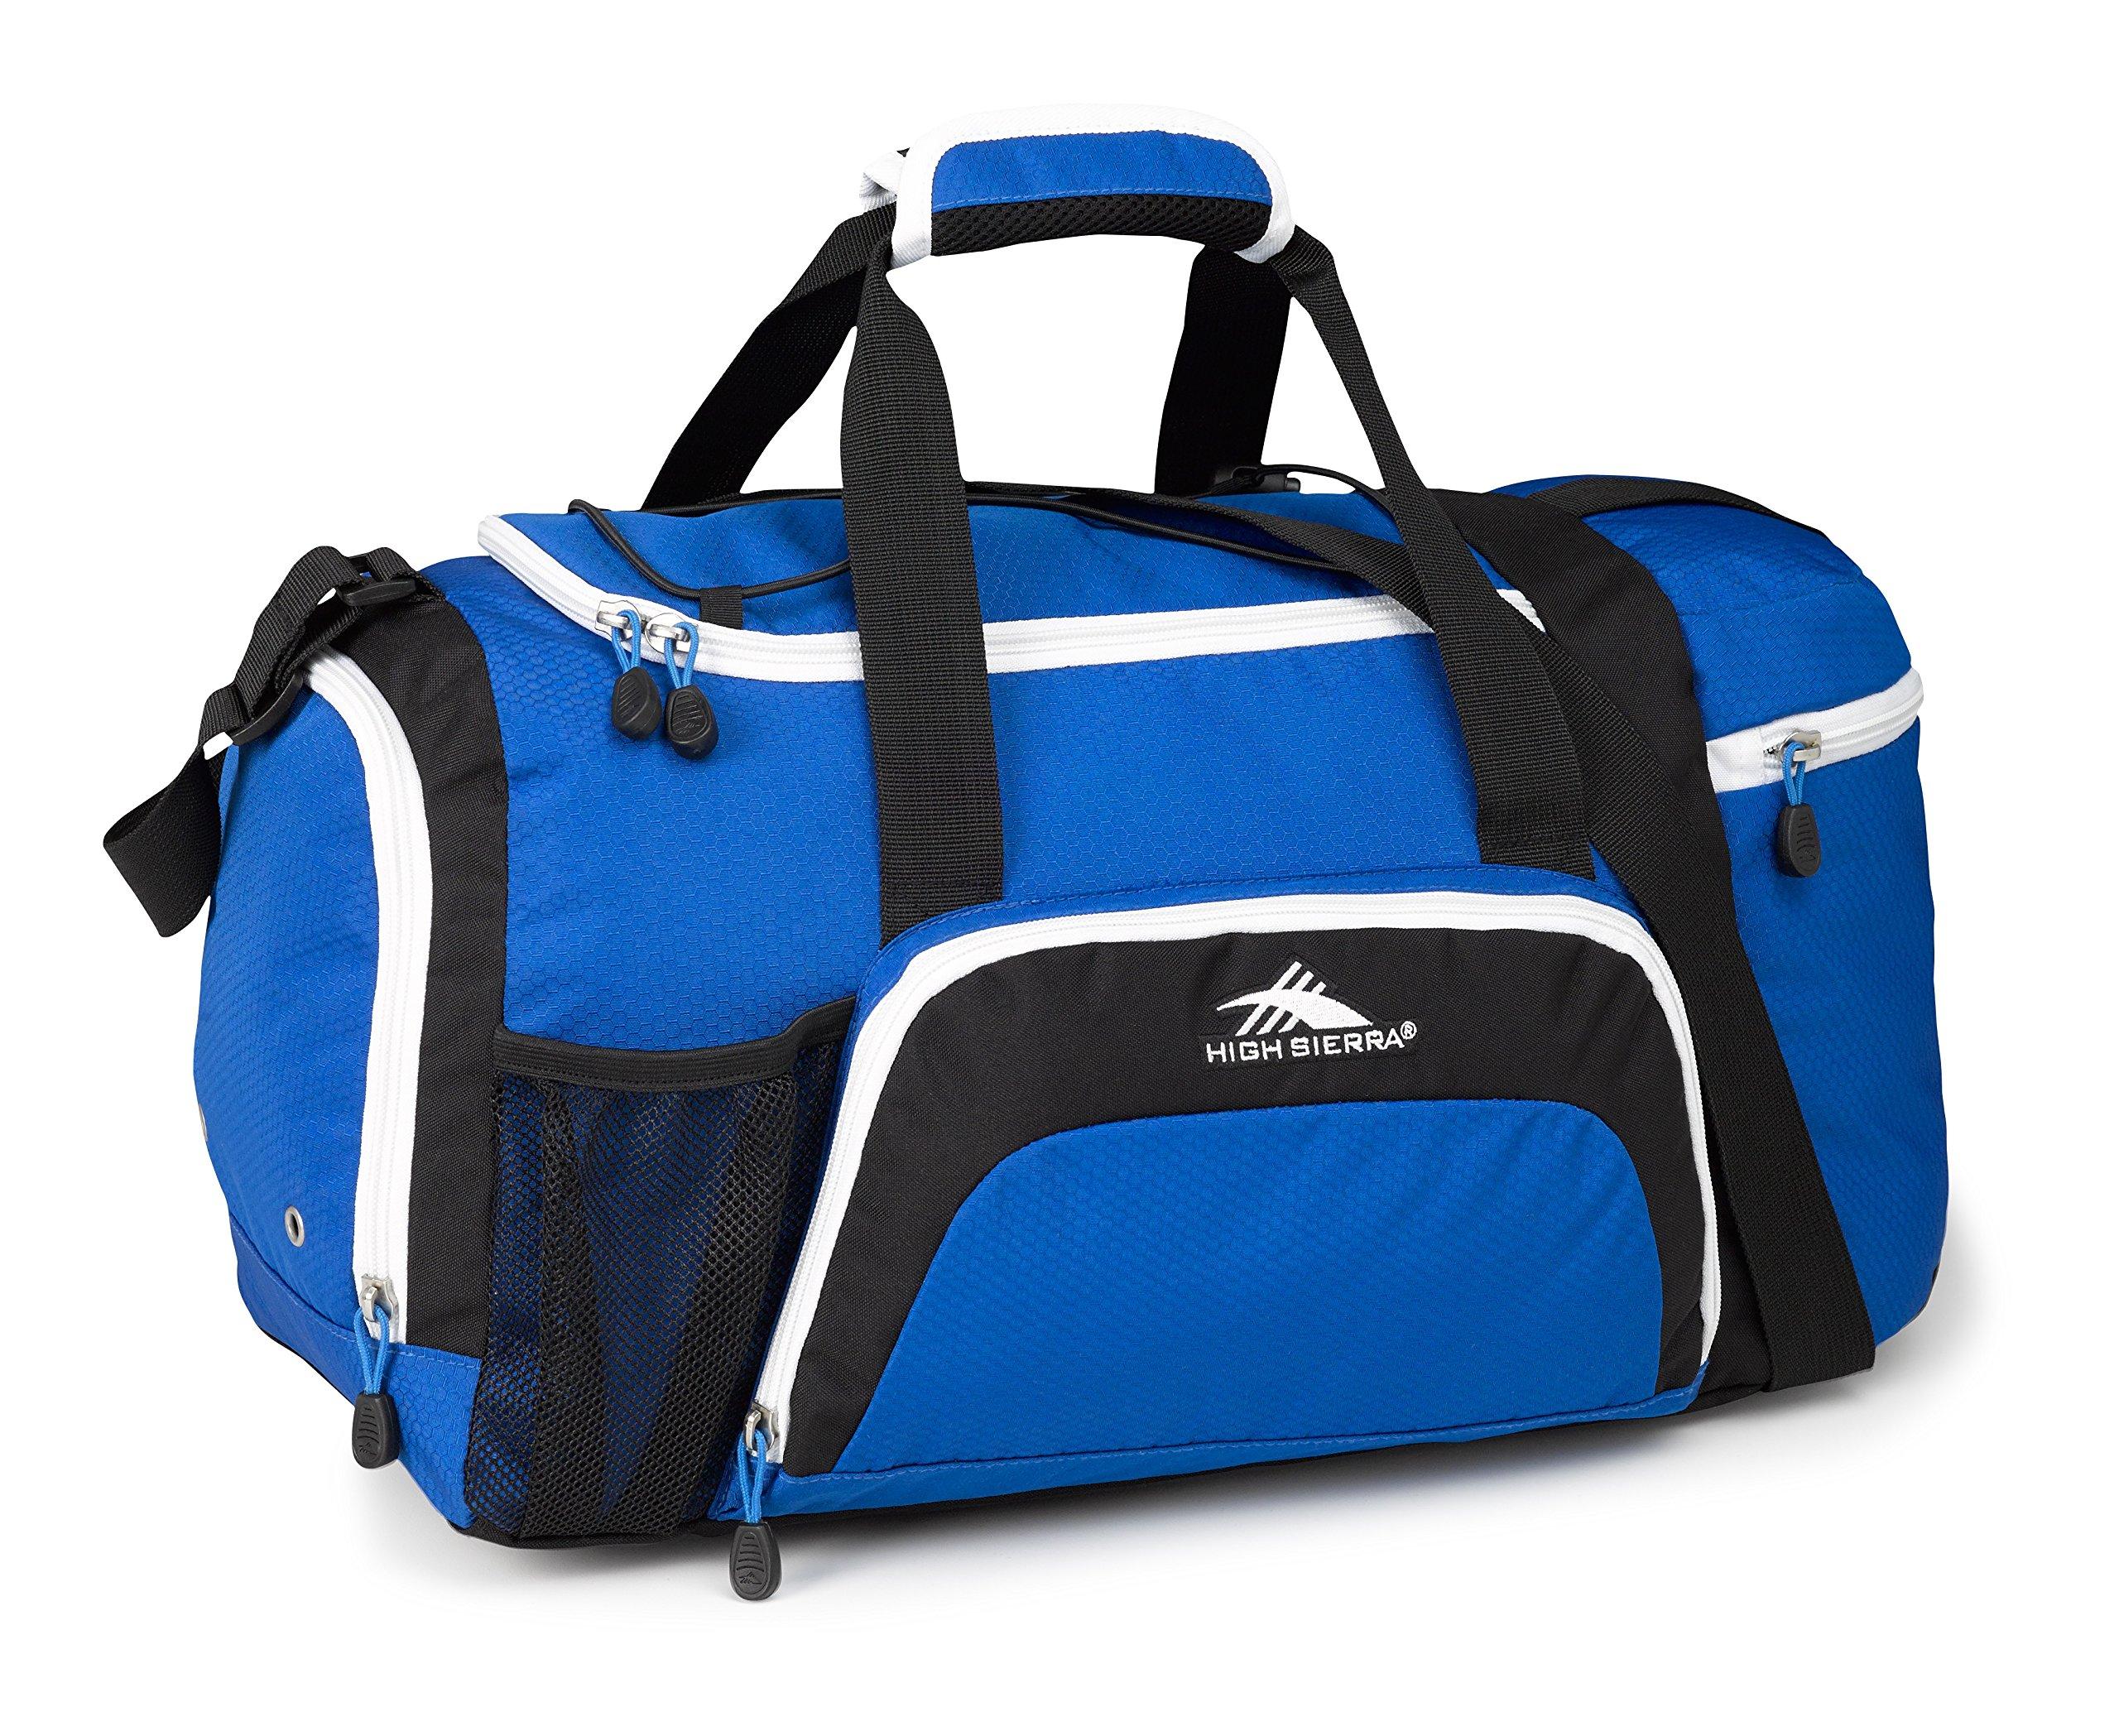 High Sierra Crossport 2 Ringleader Duffel Bag, Vivid Blue/Black/White by High Sierra